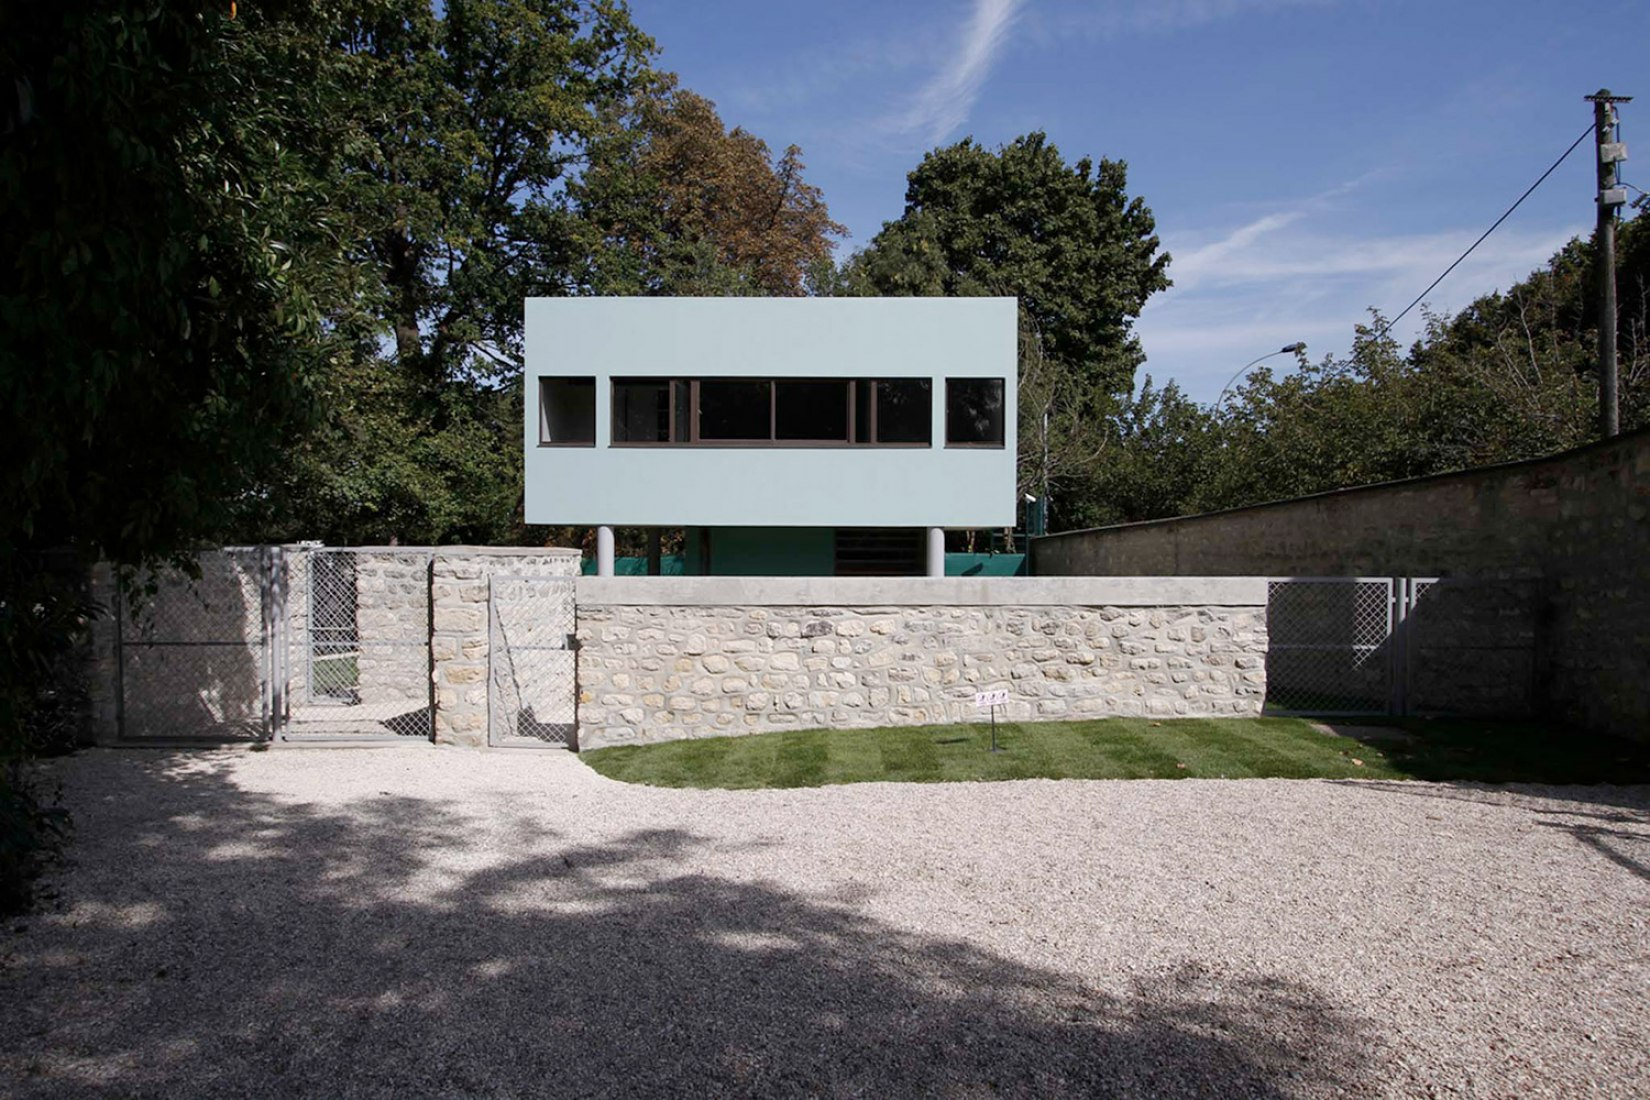 Front view. House of the Gardener of Villa Savoye. Photography © Emanuelle Metz, courtesy of CMN.